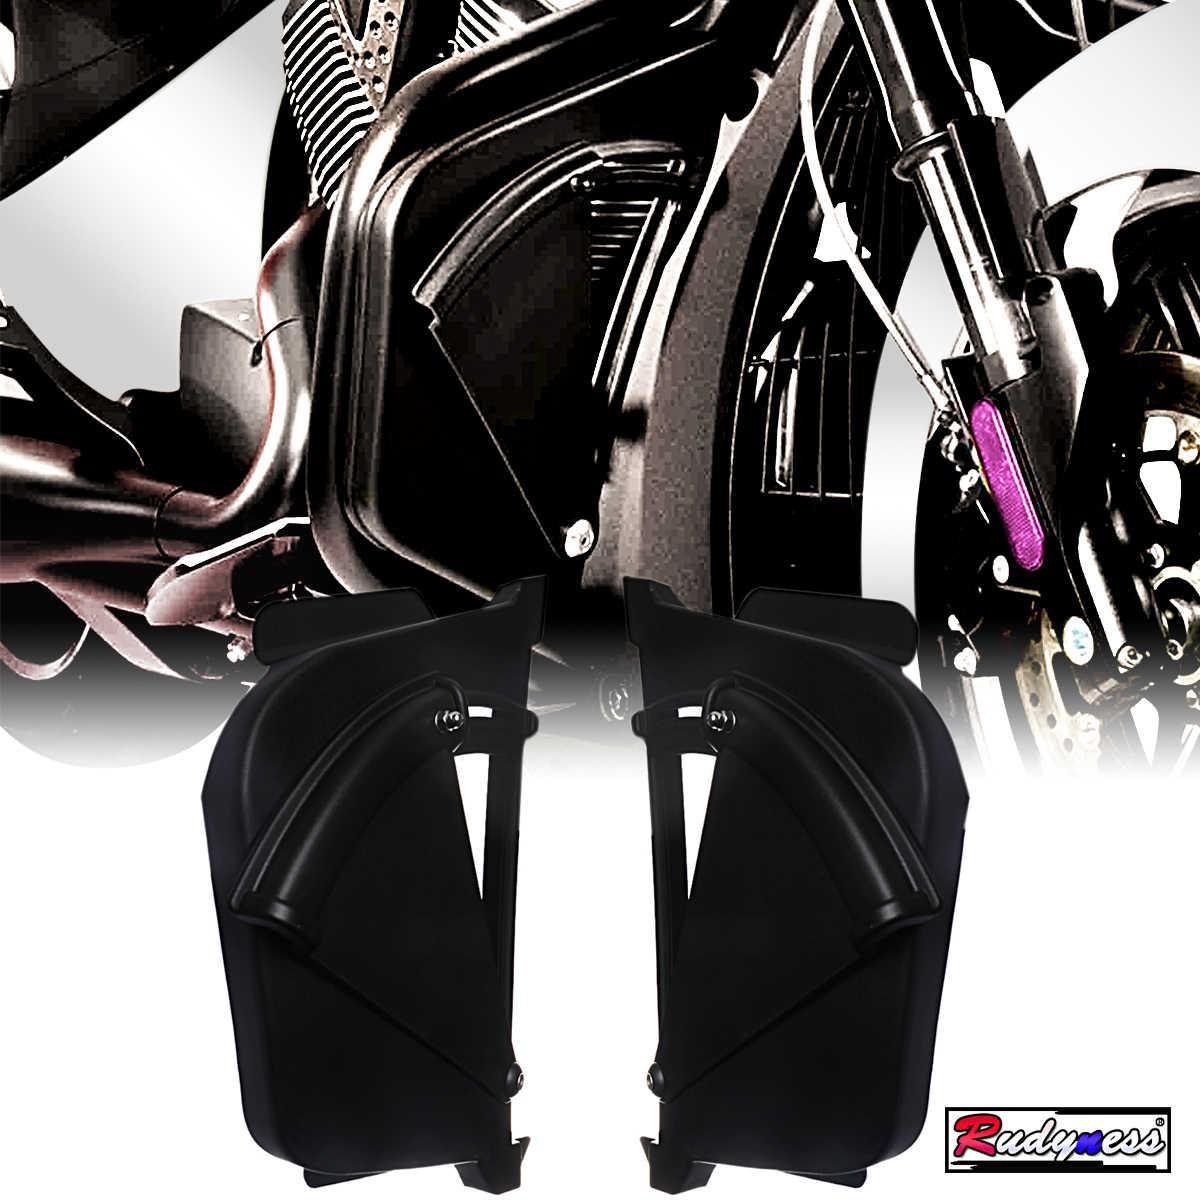 Astonishing Black Motorcycle Highway Engine Guard Crash Bar For 10 17 Machost Co Dining Chair Design Ideas Machostcouk